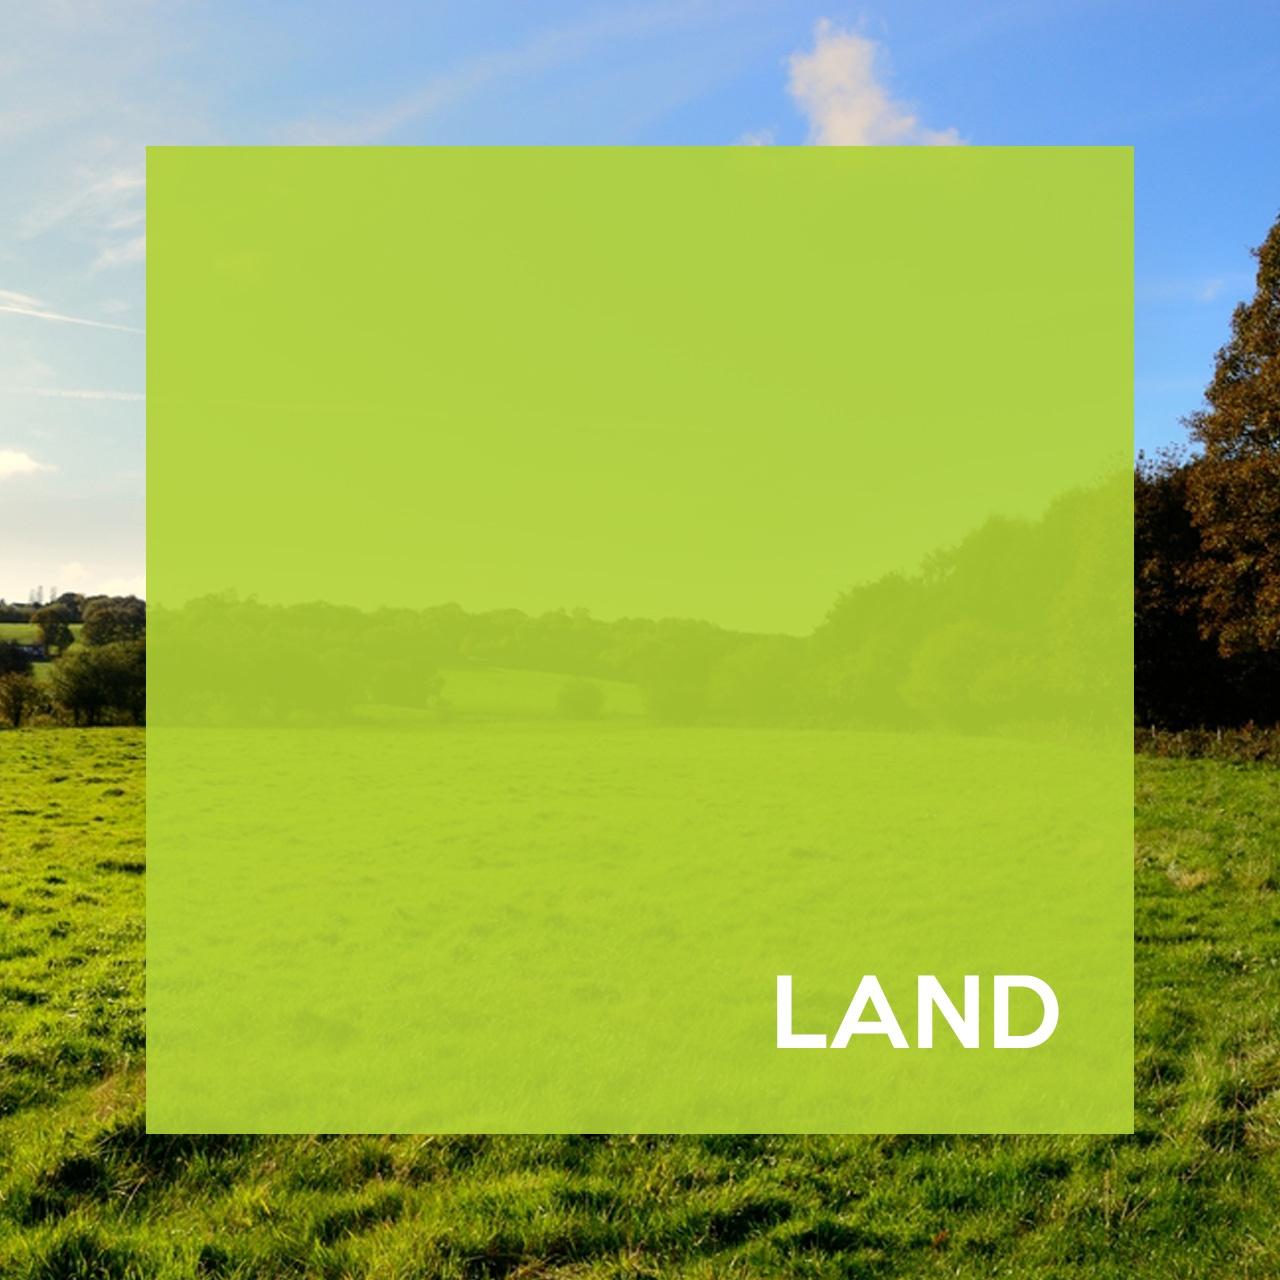 AMI_RESIDENTIAL__land_-_011.jpg